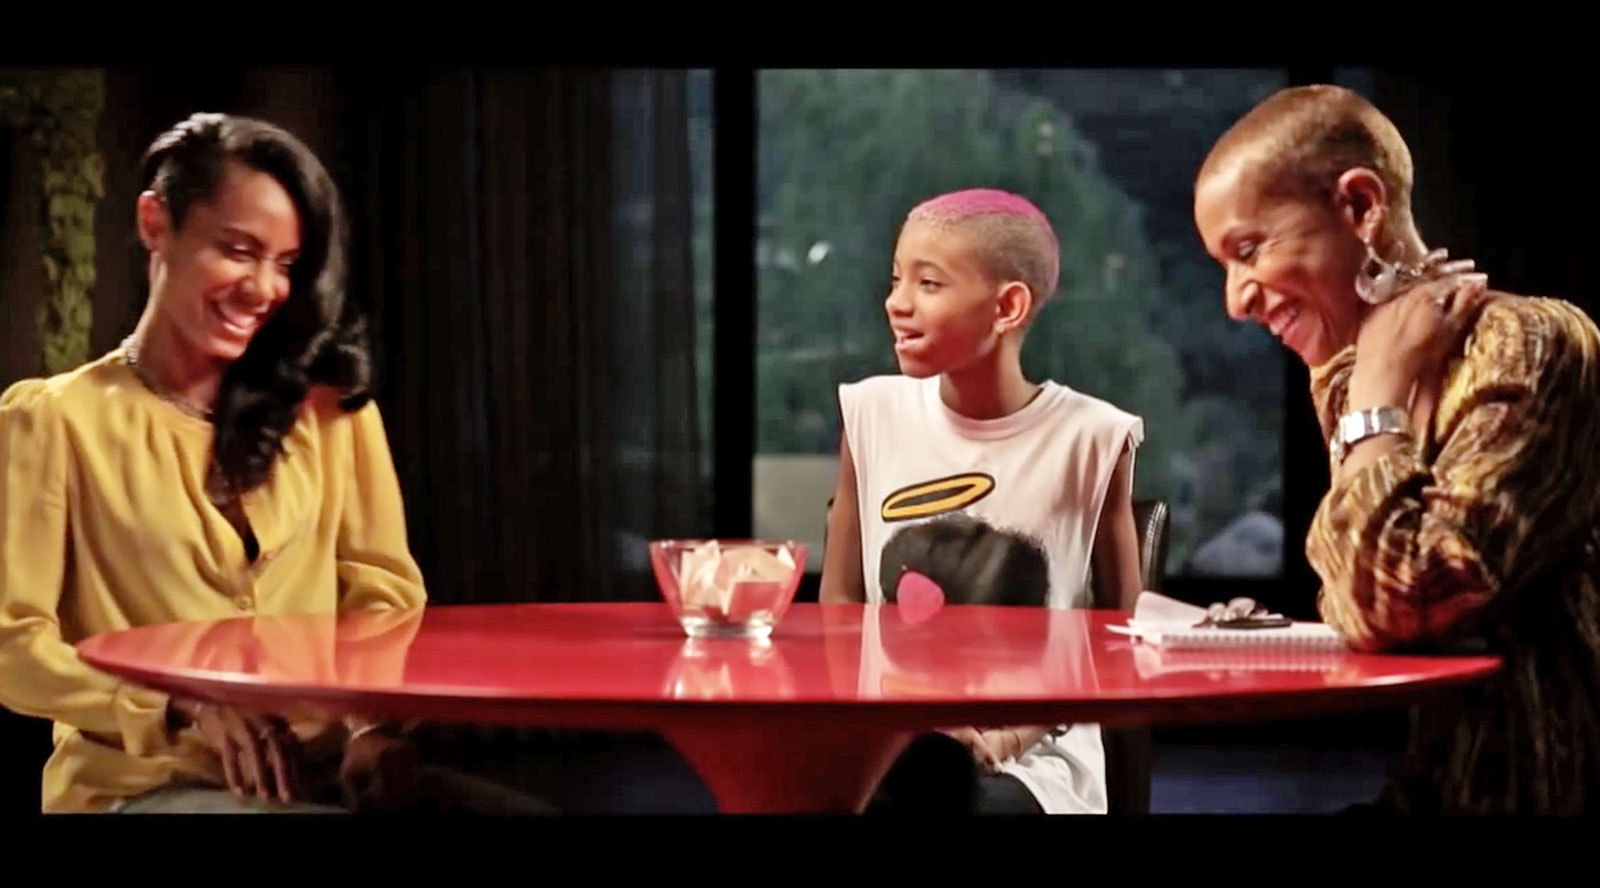 Facebook taps Jada Pinkett Smith for new talk show series